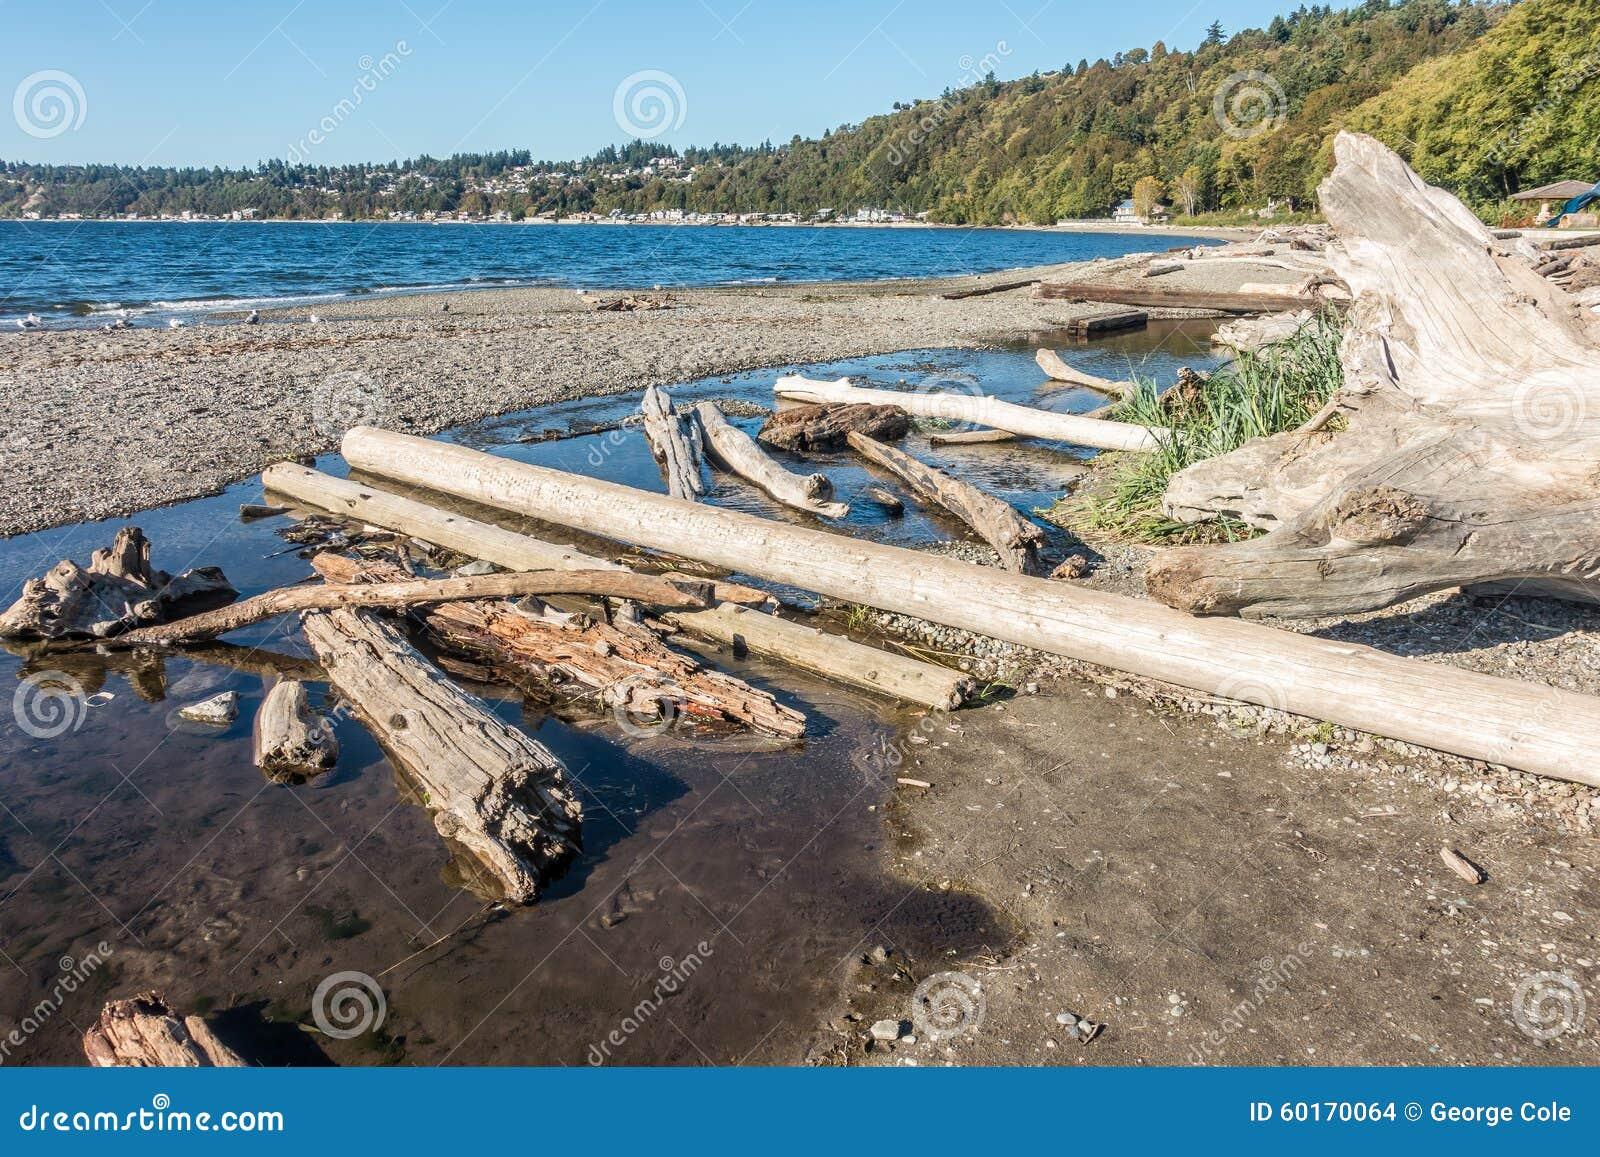 Seahurst Dirftwood Logs